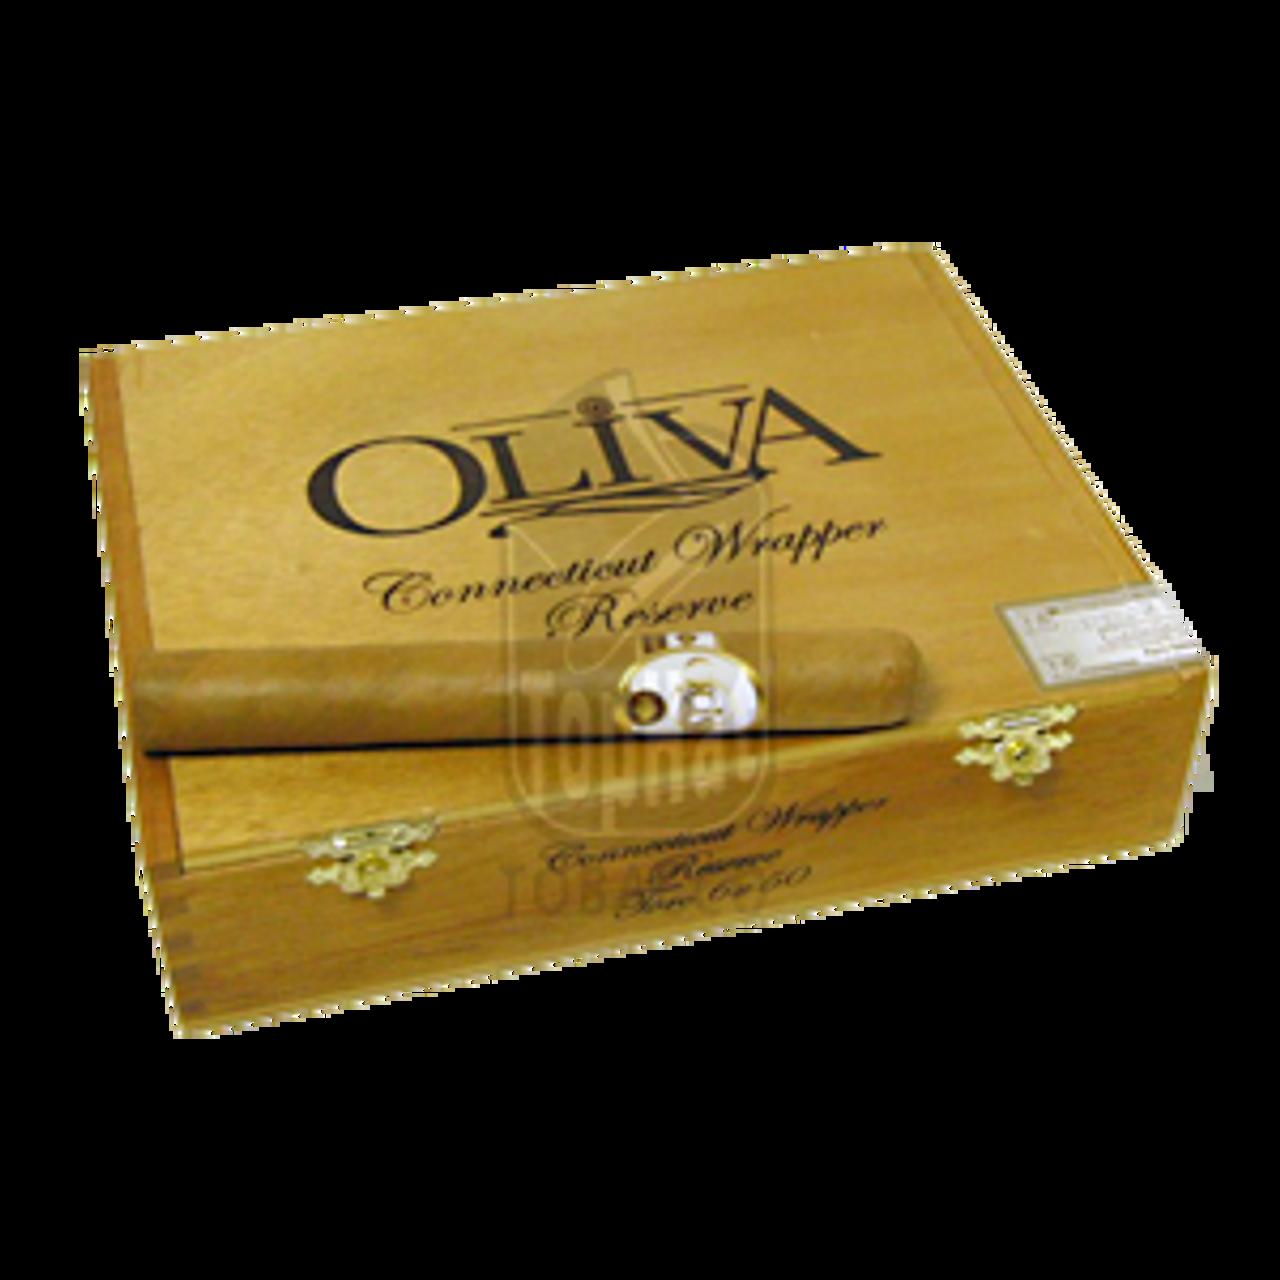 Oliva Connecticut Reserve Toro Cigars - 6 x 50 (Box of 20)